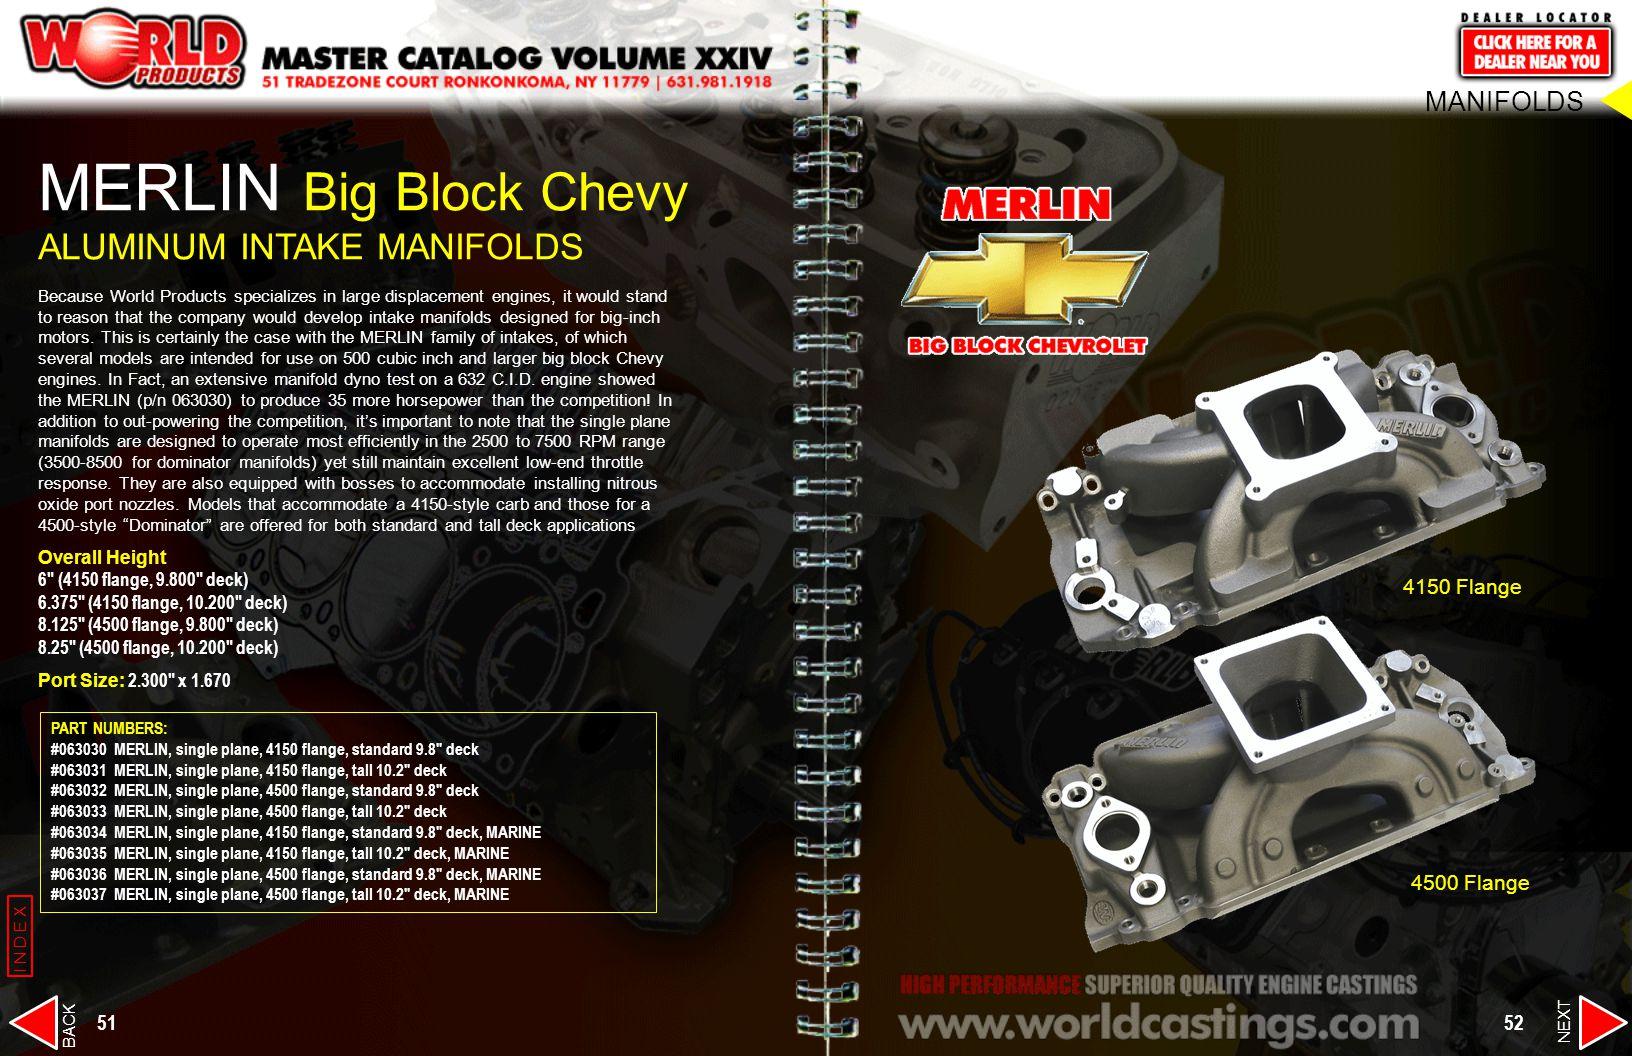 MERLIN Big Block Chevy ALUMINUM INTAKE MANIFOLDS